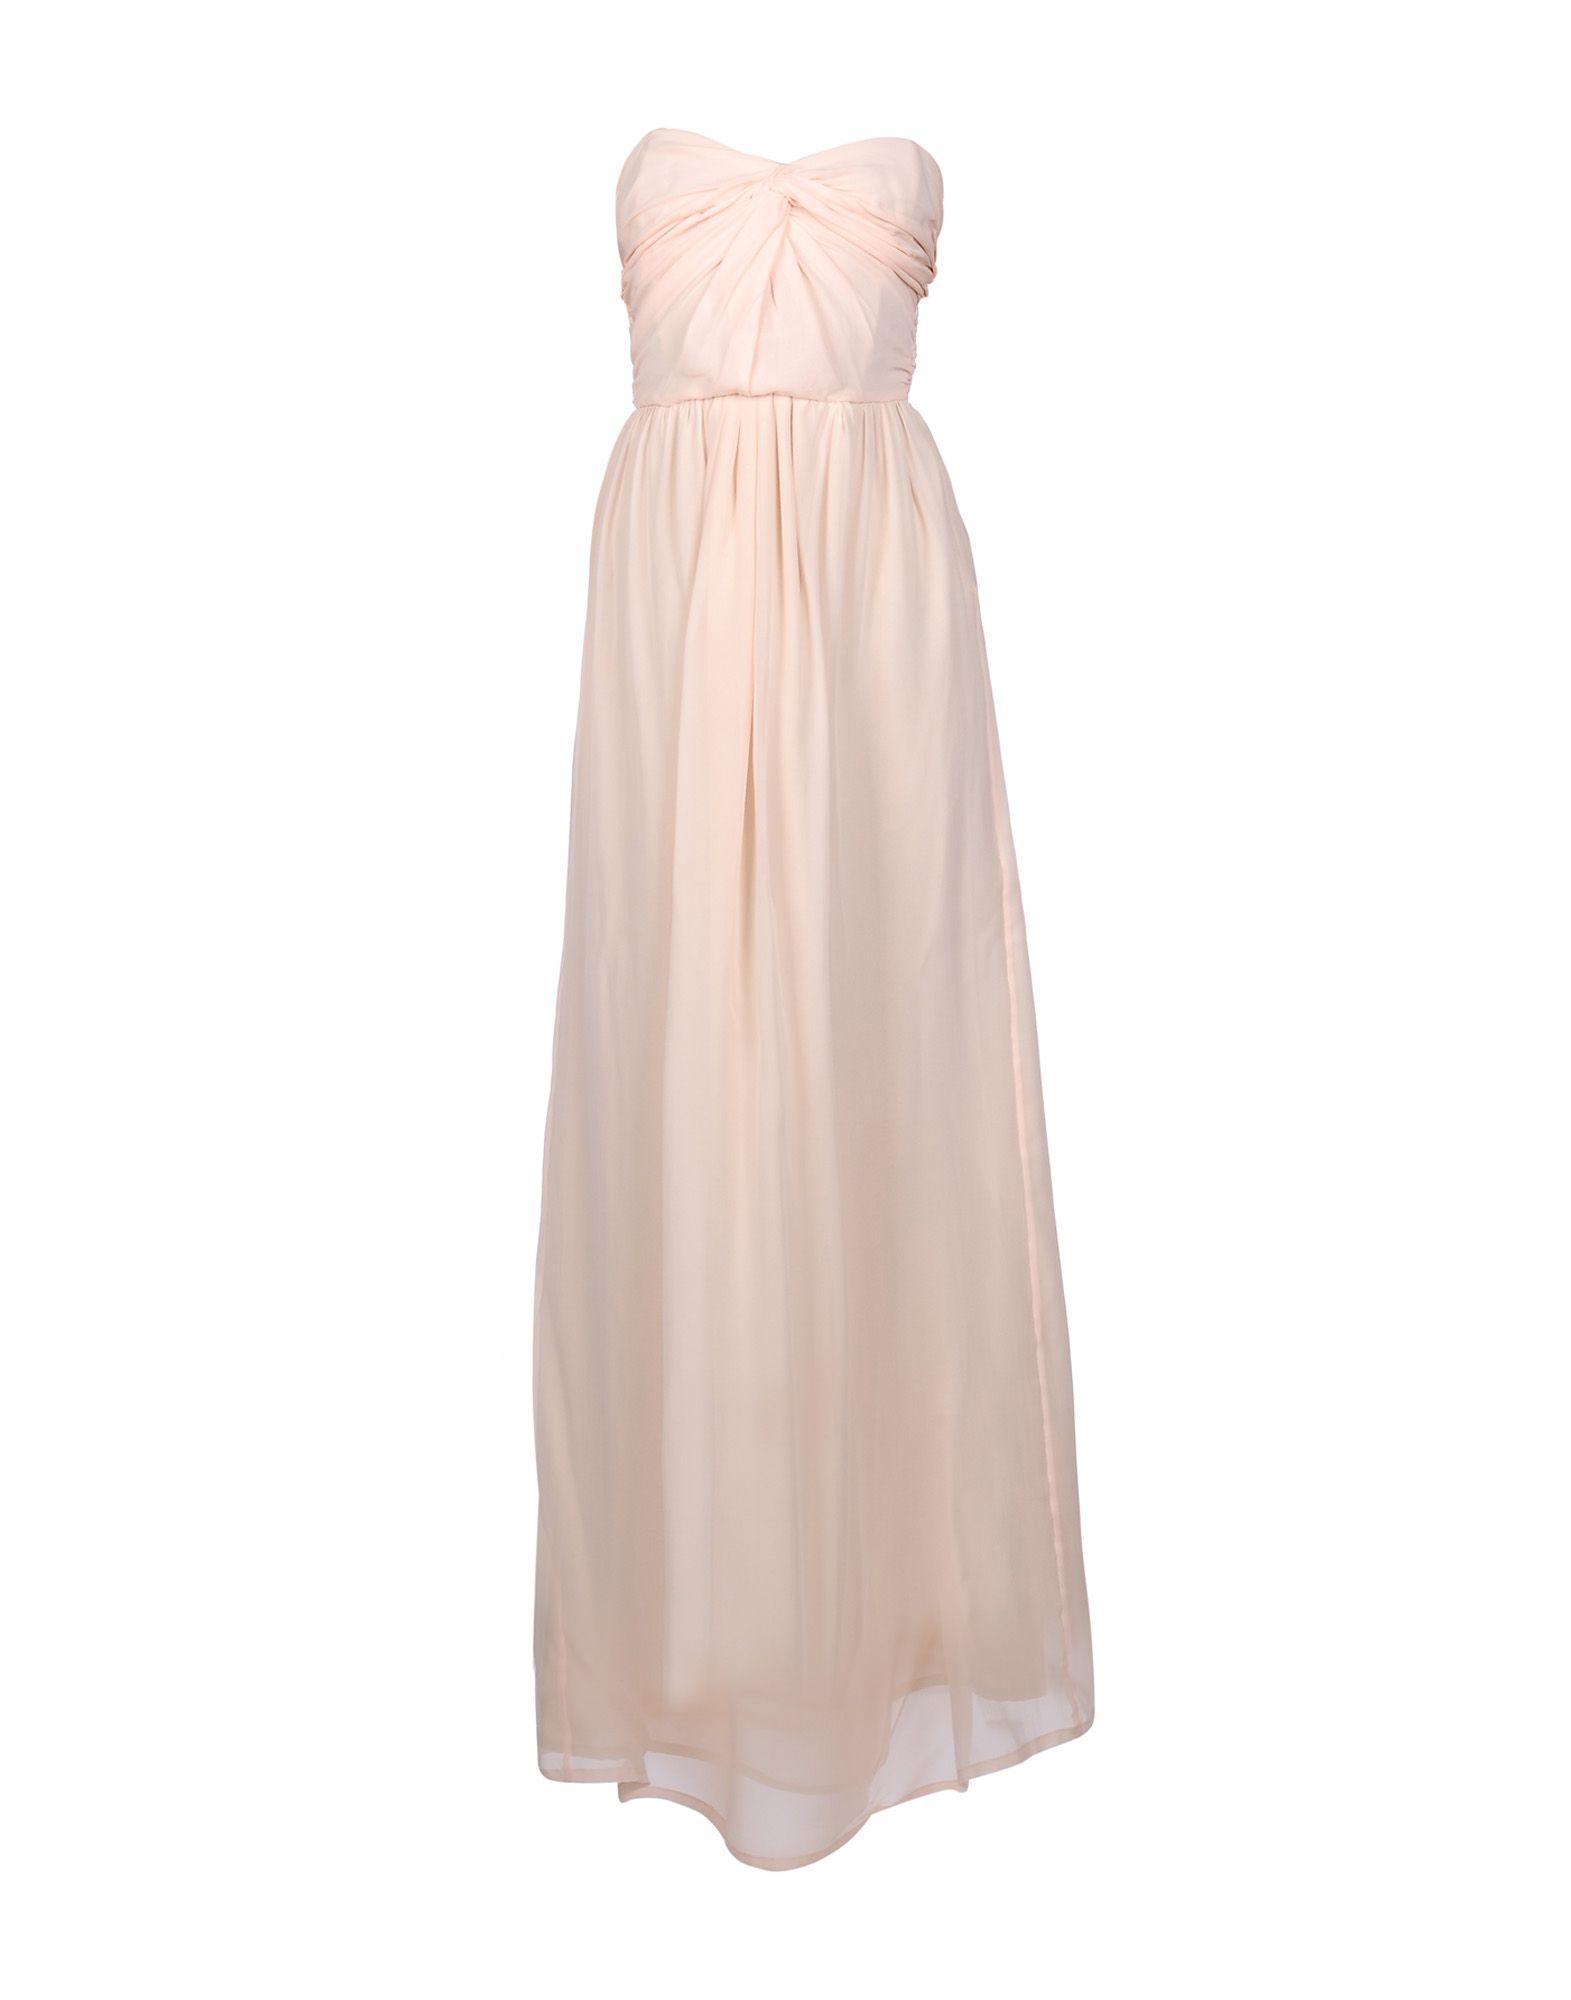 PATRIZIA PEPE - ROBES - Robes longues